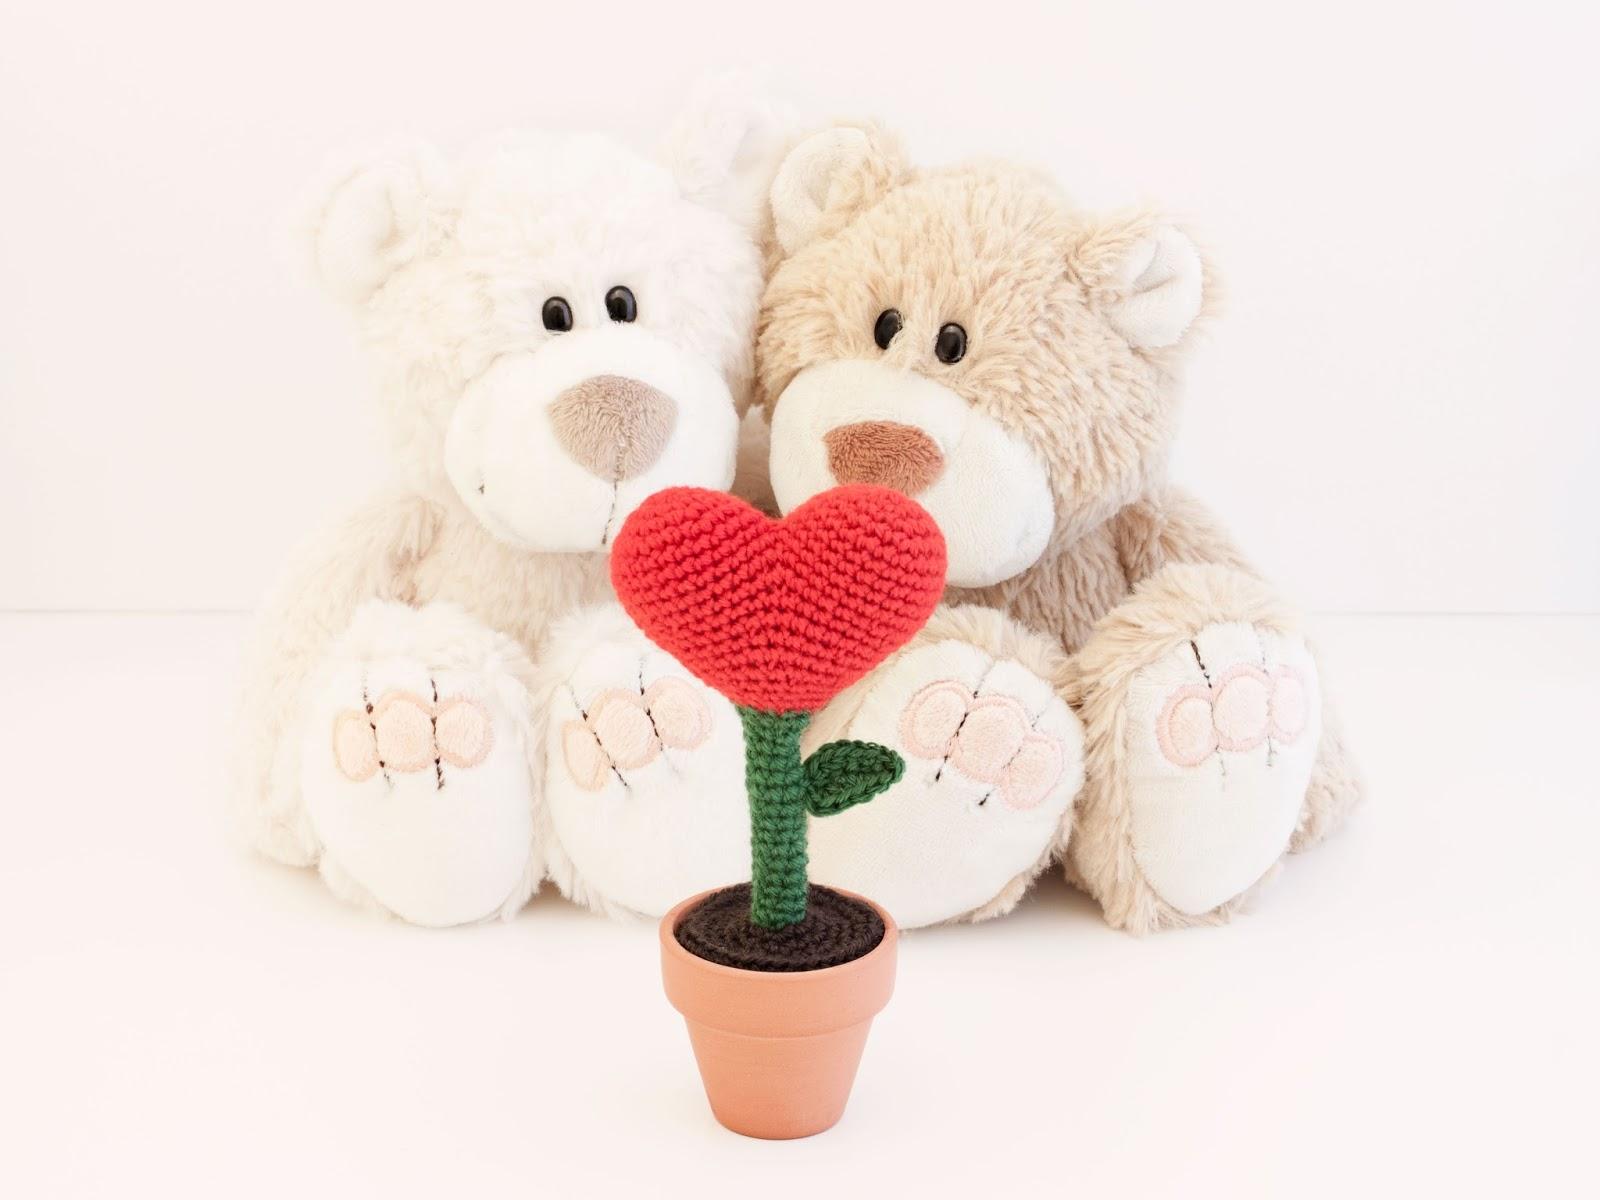 amigurumi-flor-corazon-flower-heart-pattern-patrón